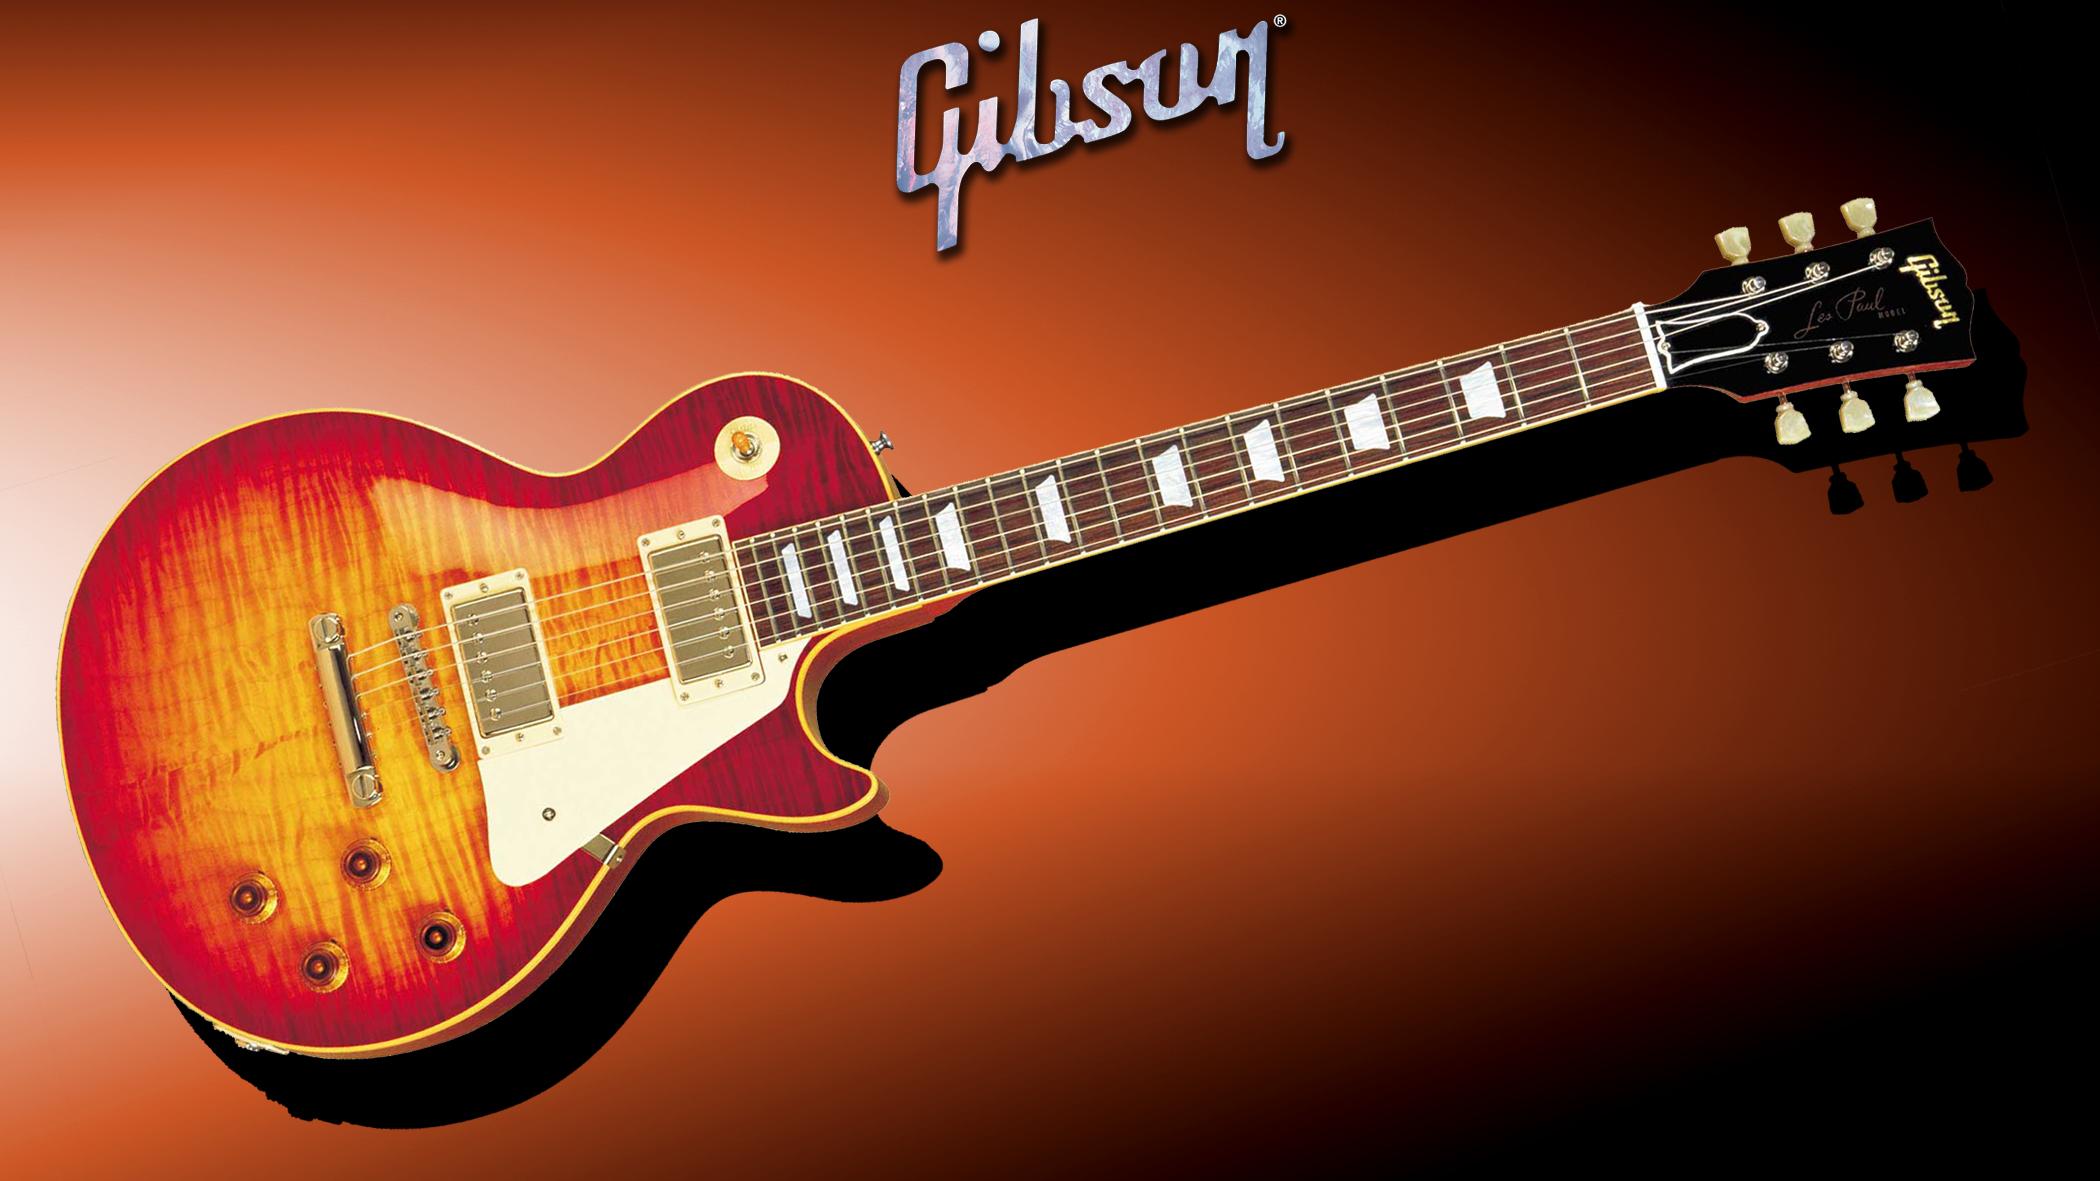 guitar wallpaper widescreen - photo #30